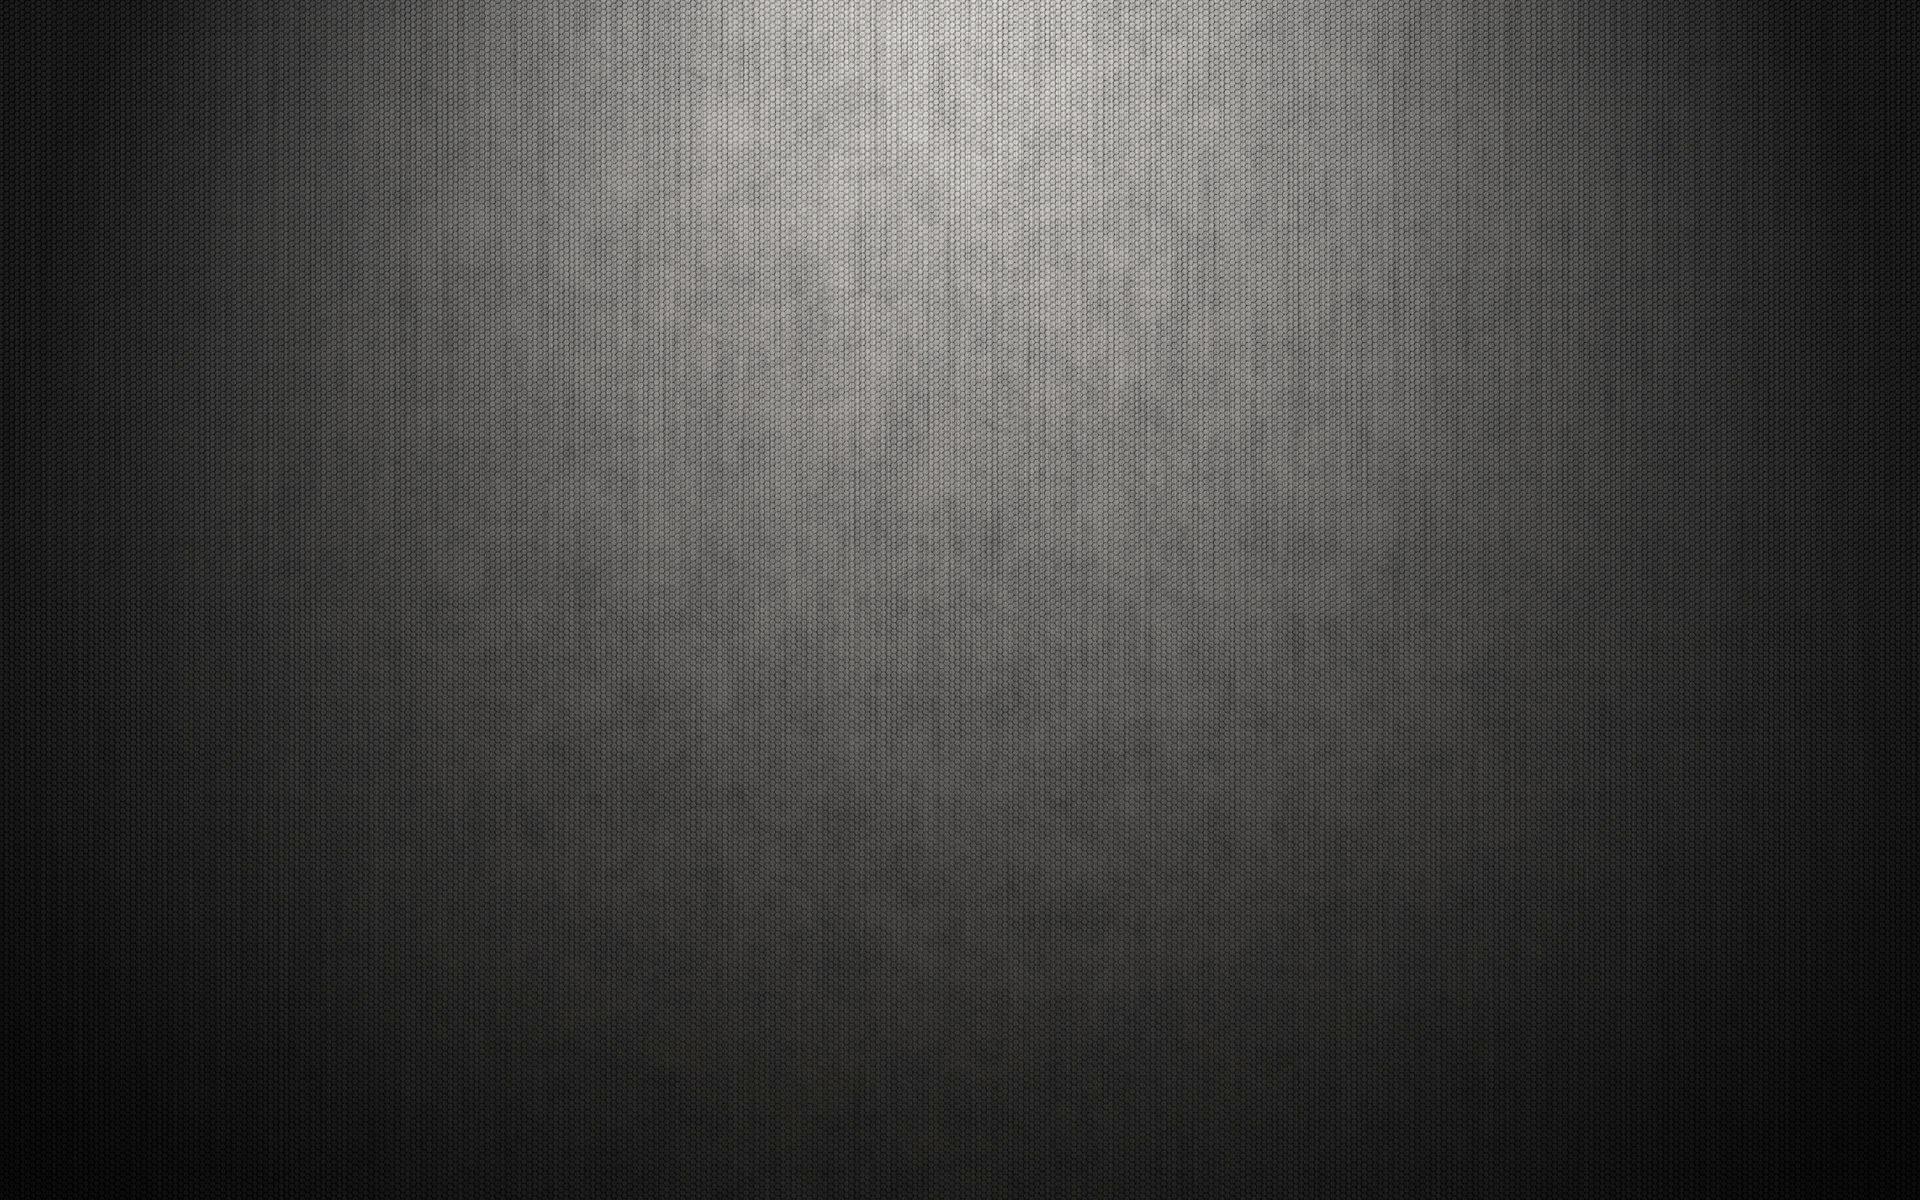 /var/www/html/wp-content/uploads/2018/10/backgrounds_grey